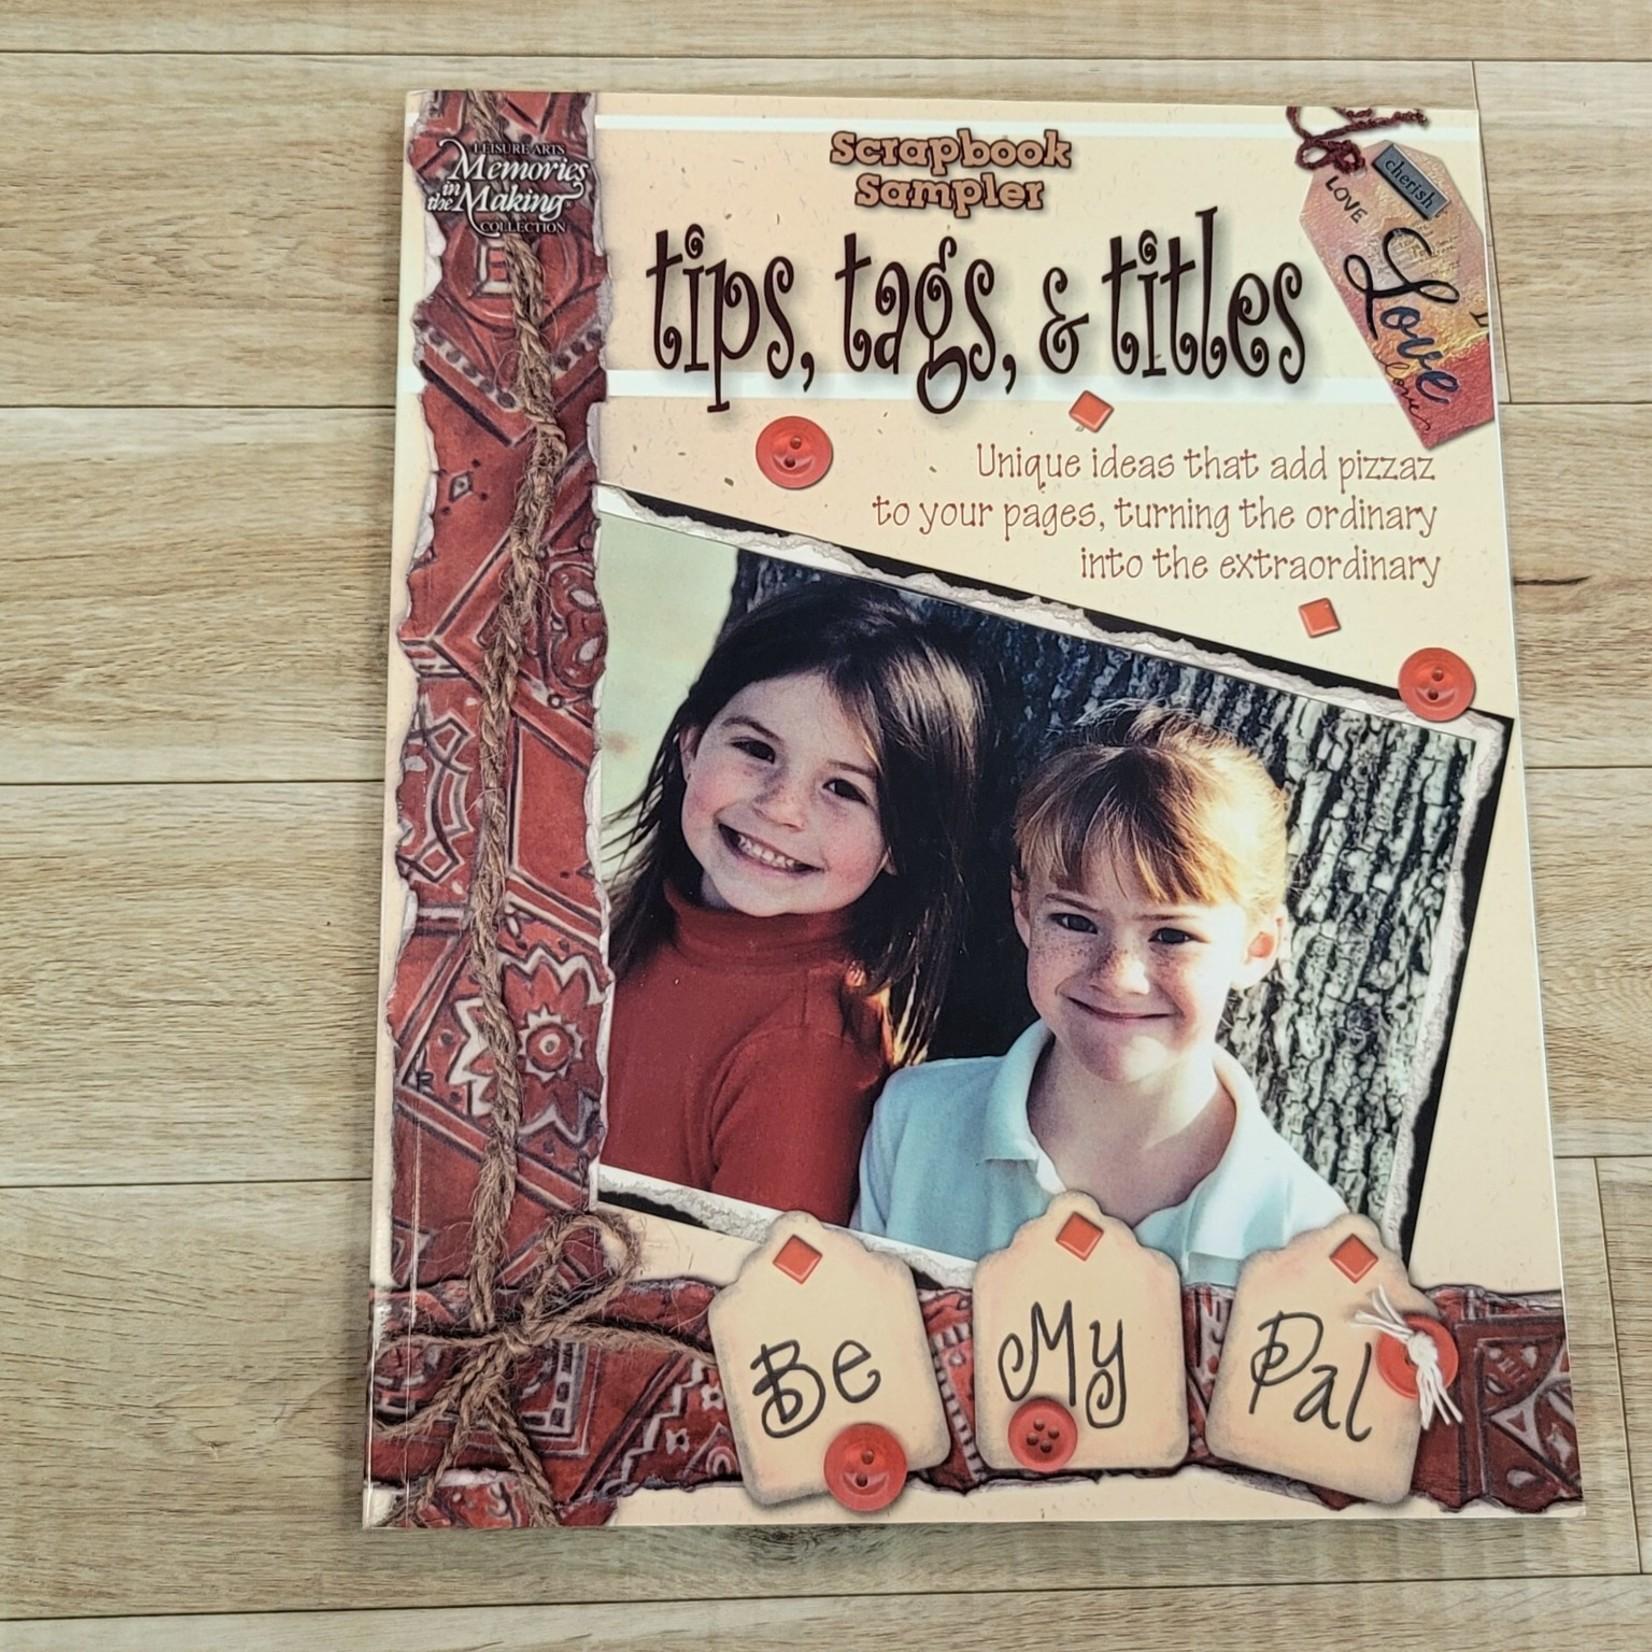 Scrapbooking Books - Scrapbook Sampler - tips, tags & titles